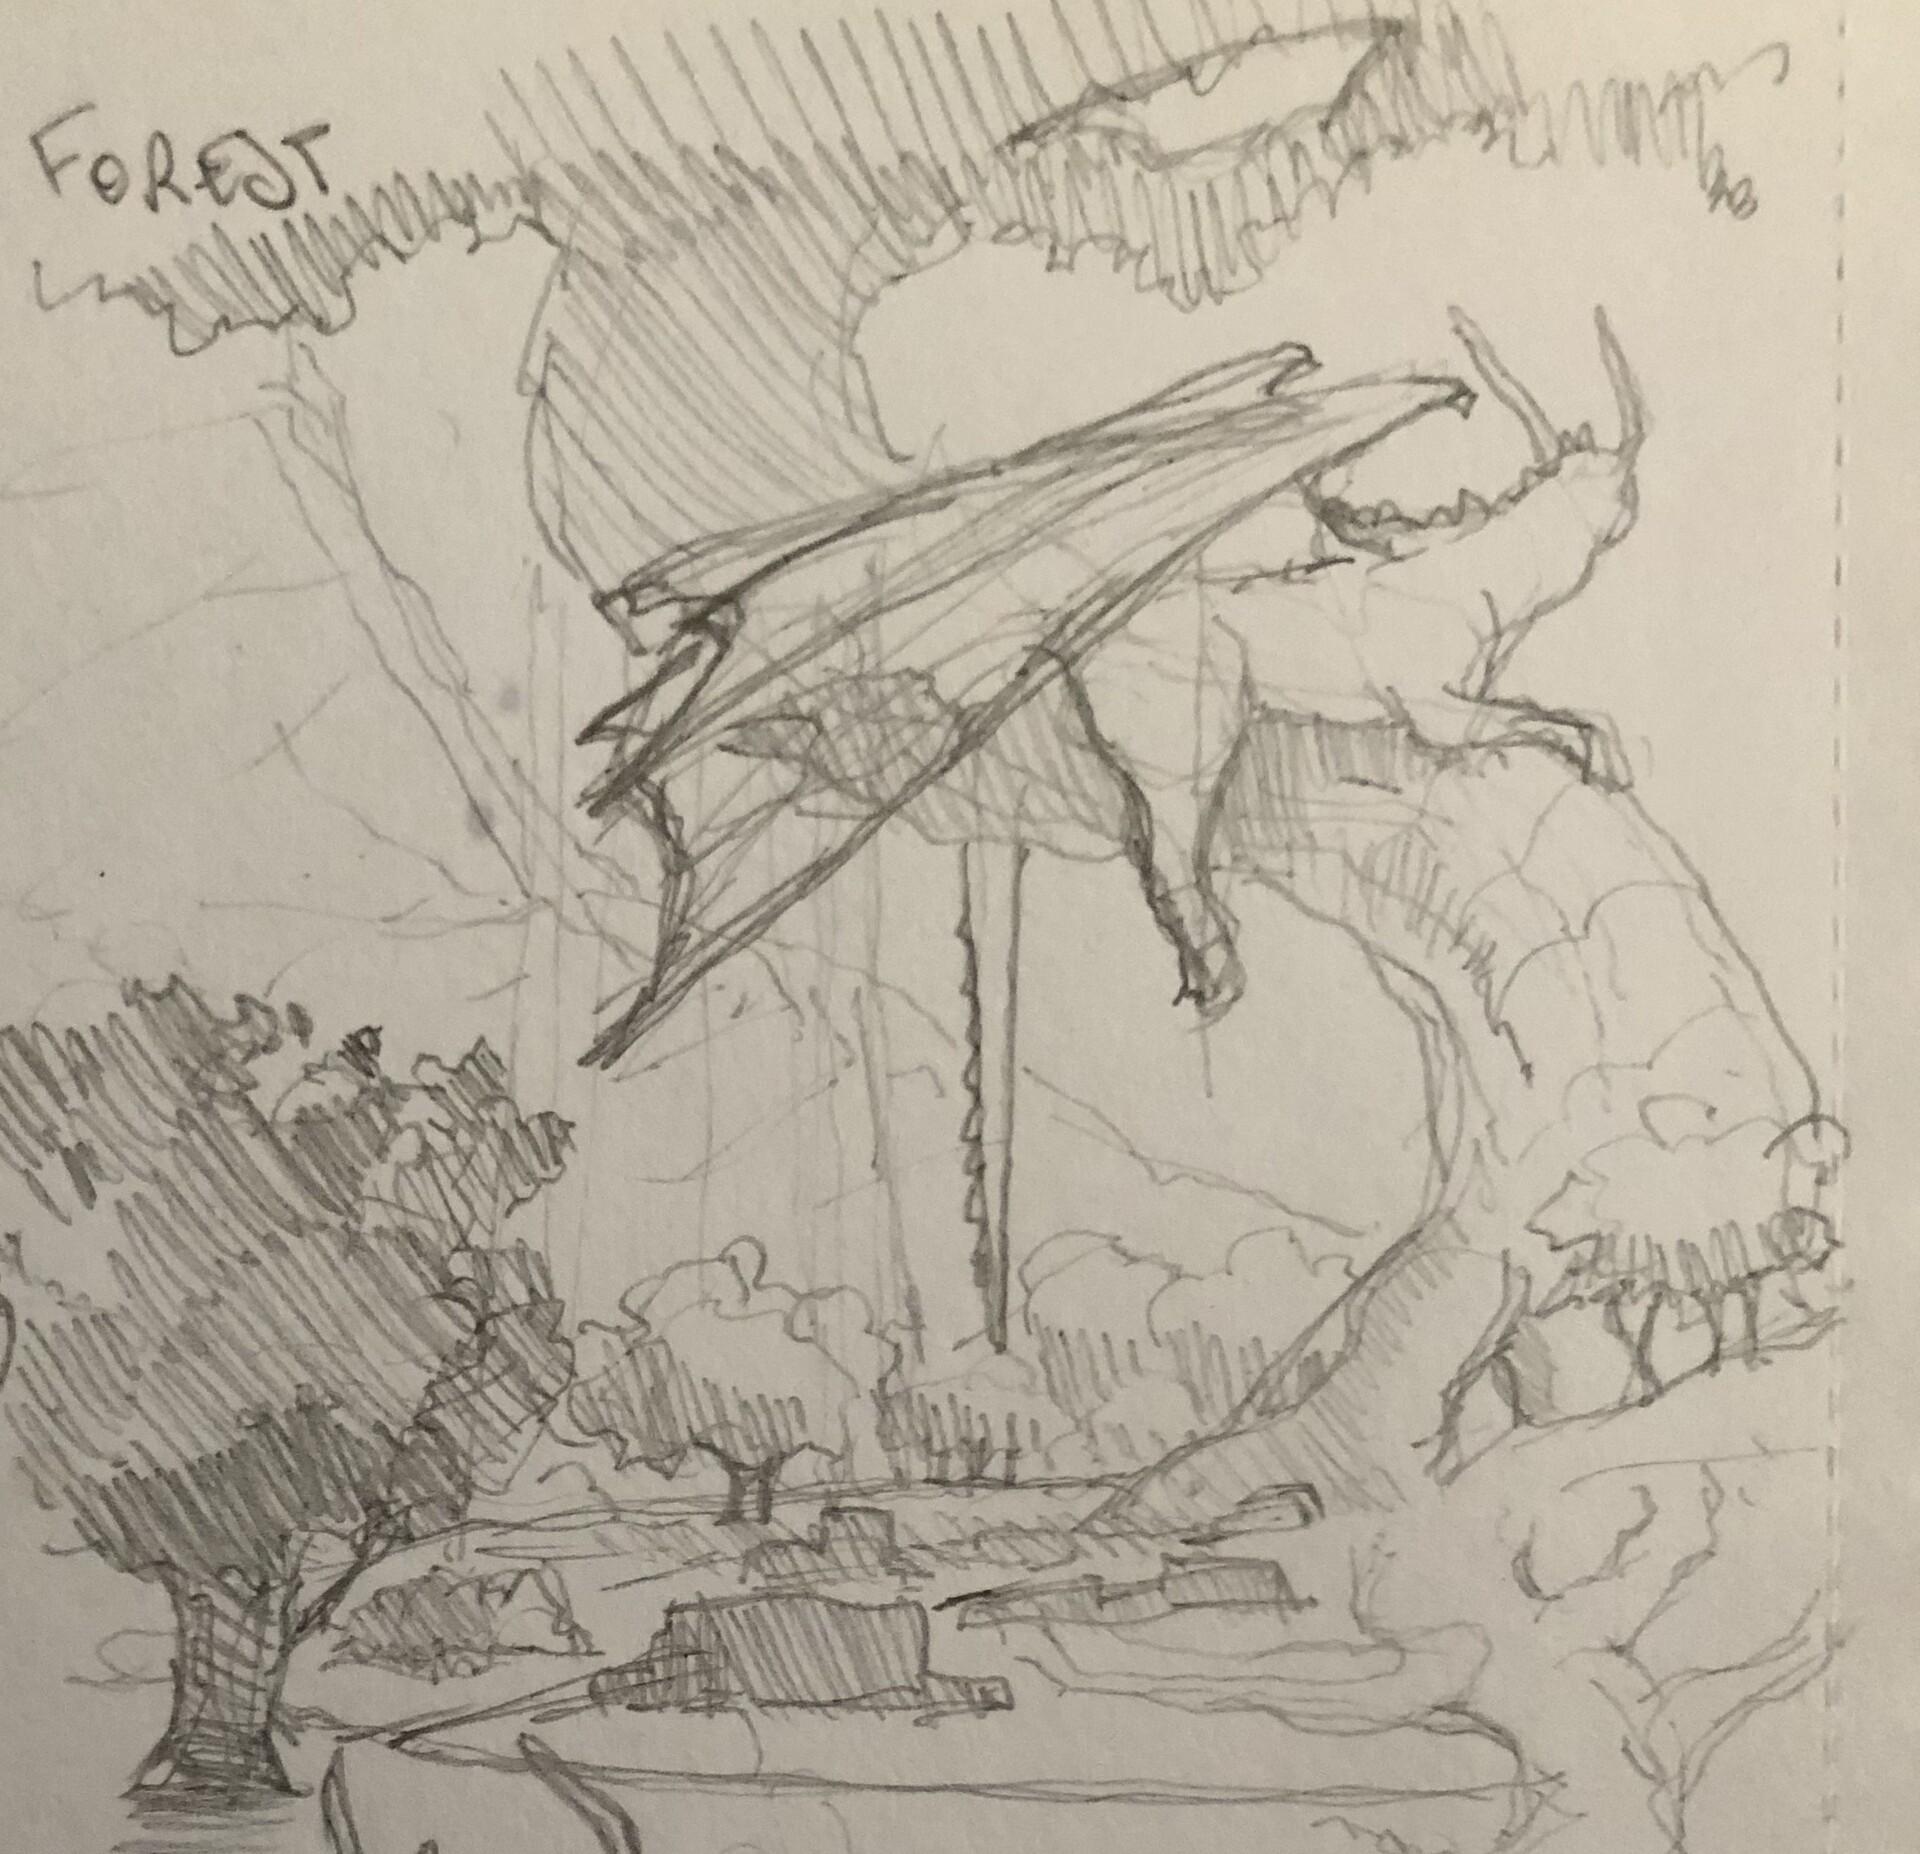 Initial sketch idea